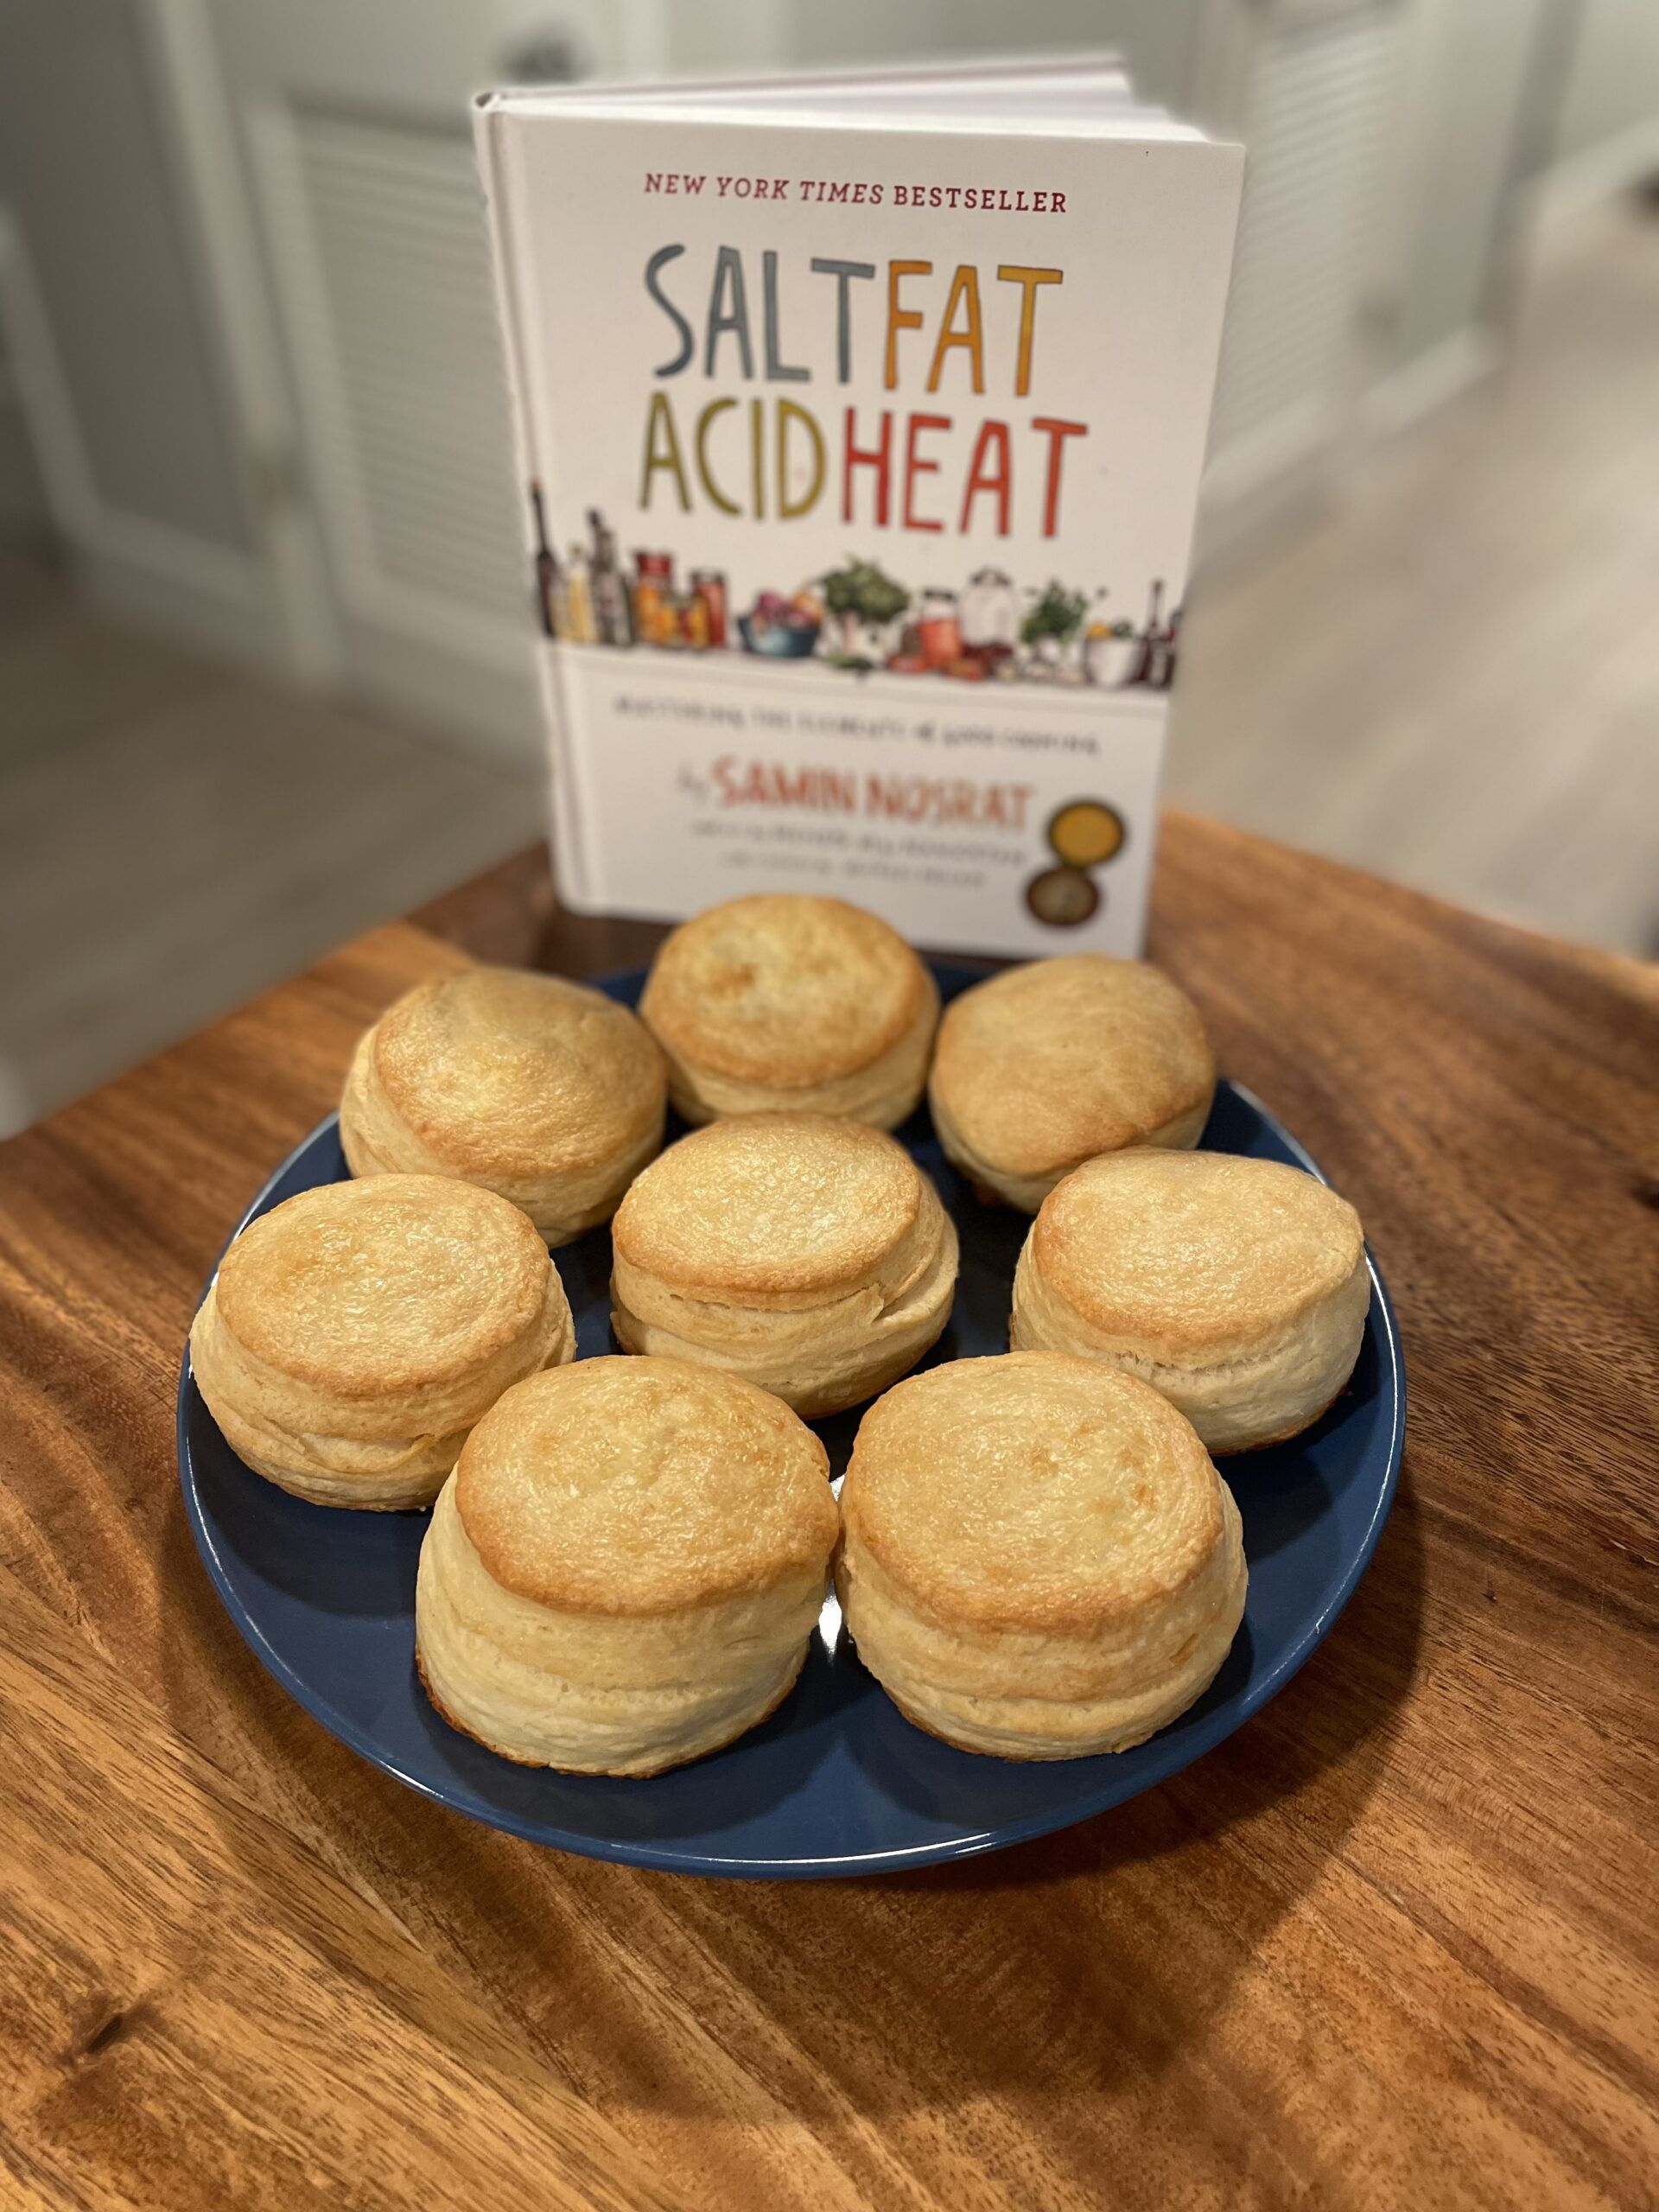 Salt, Fat, Acid, Heat cookbook with a plate of buttermilk biscuits